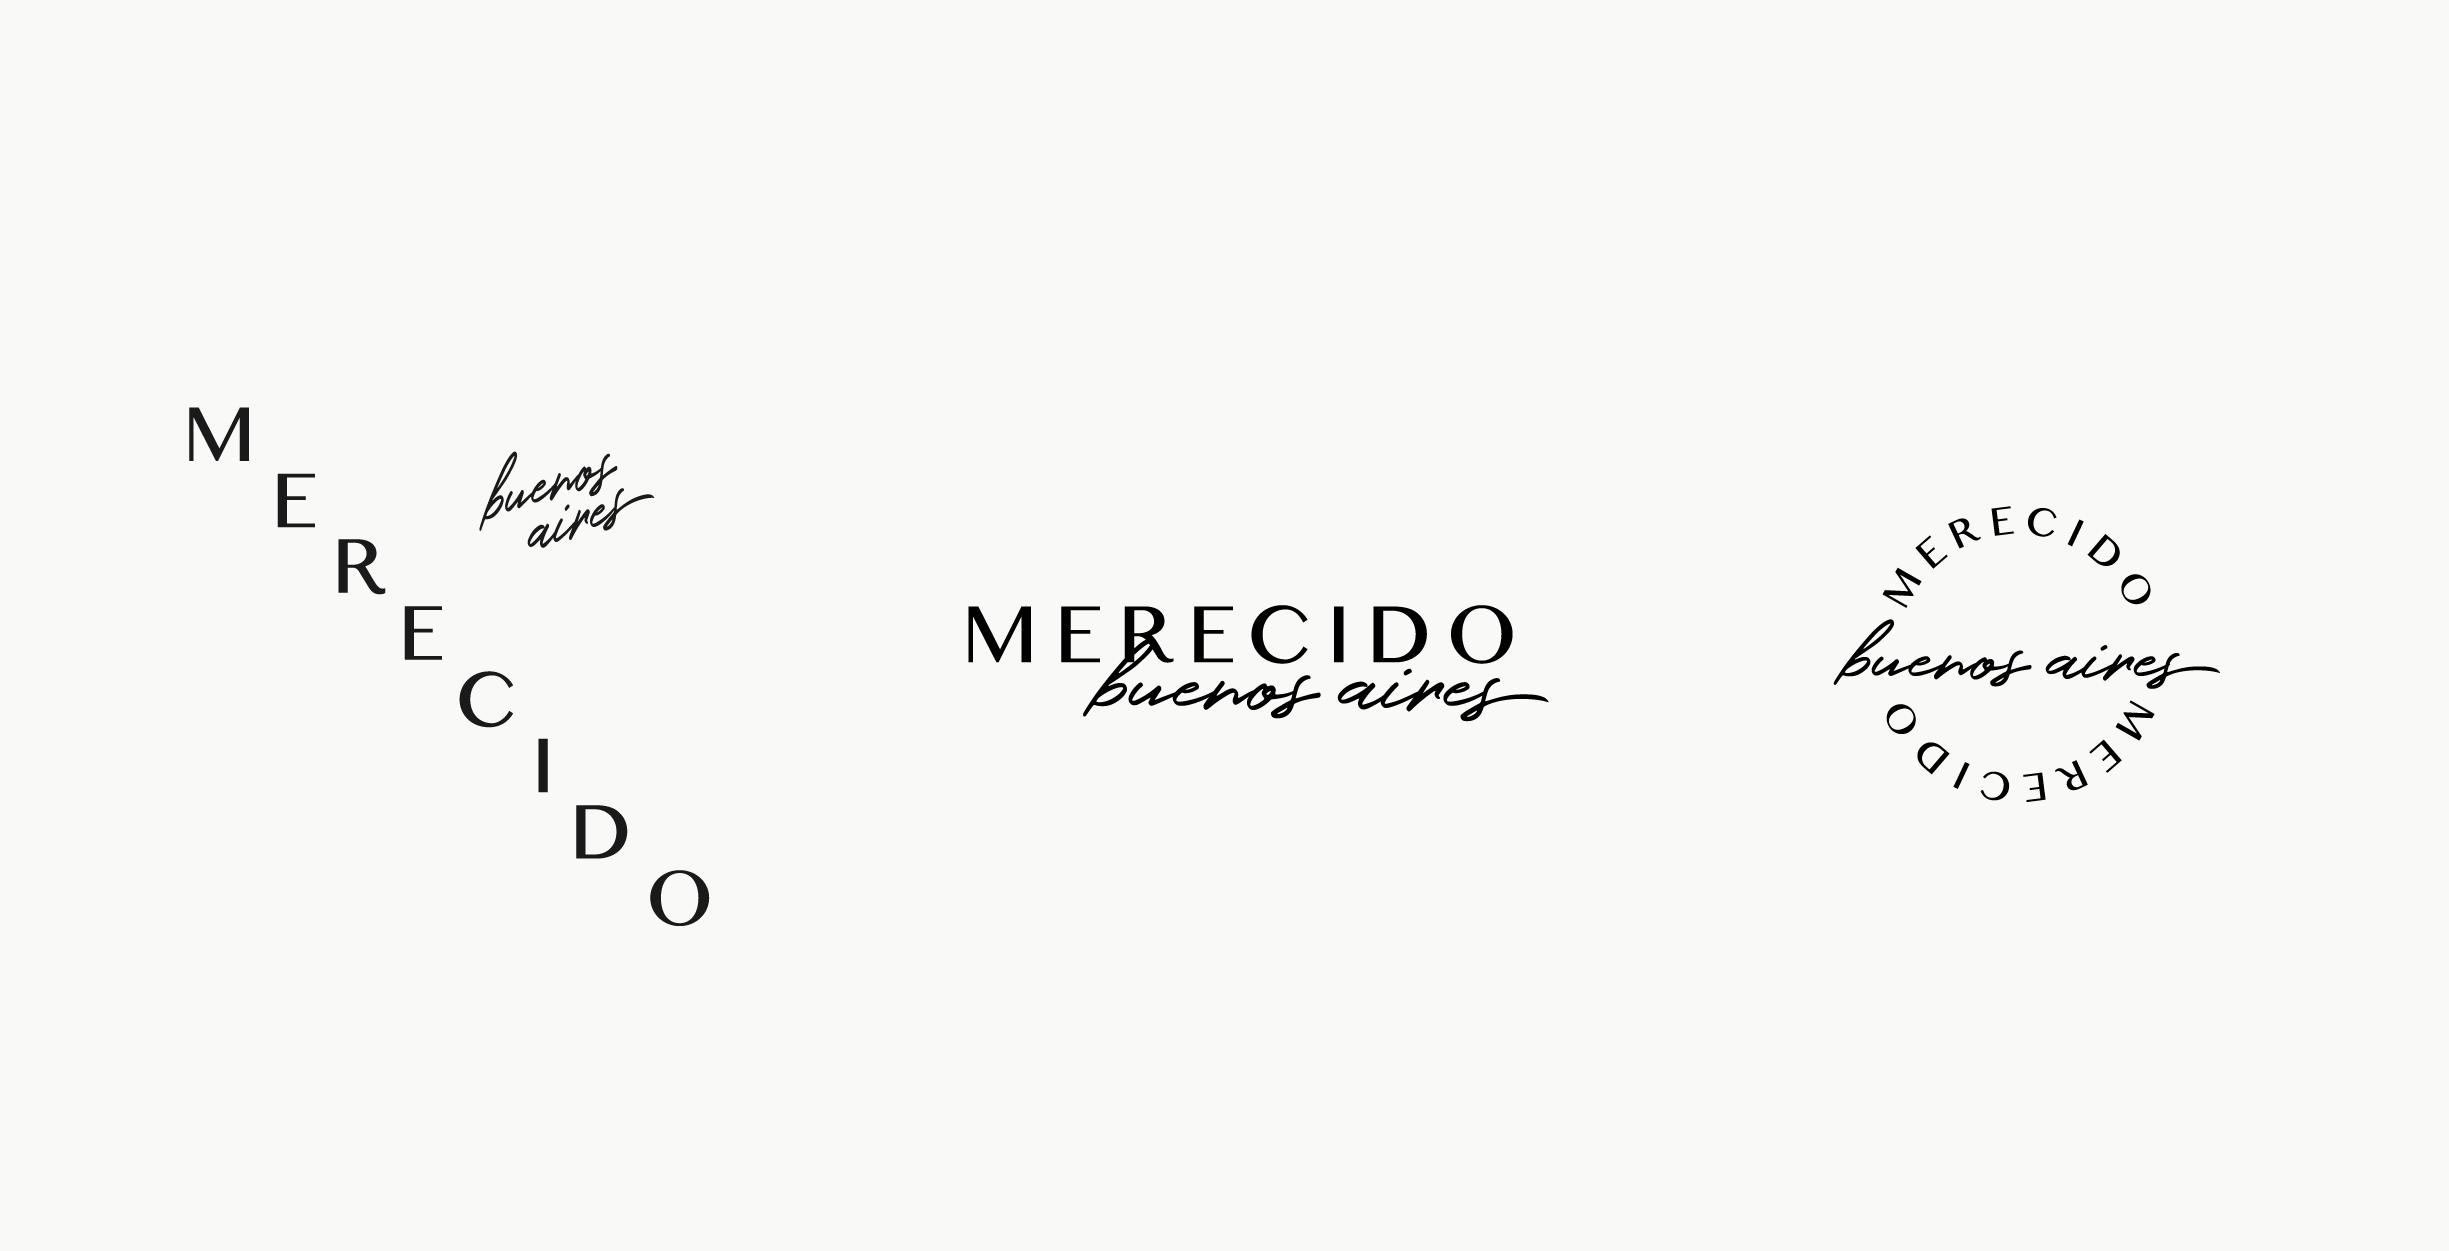 logos-2-v4-20